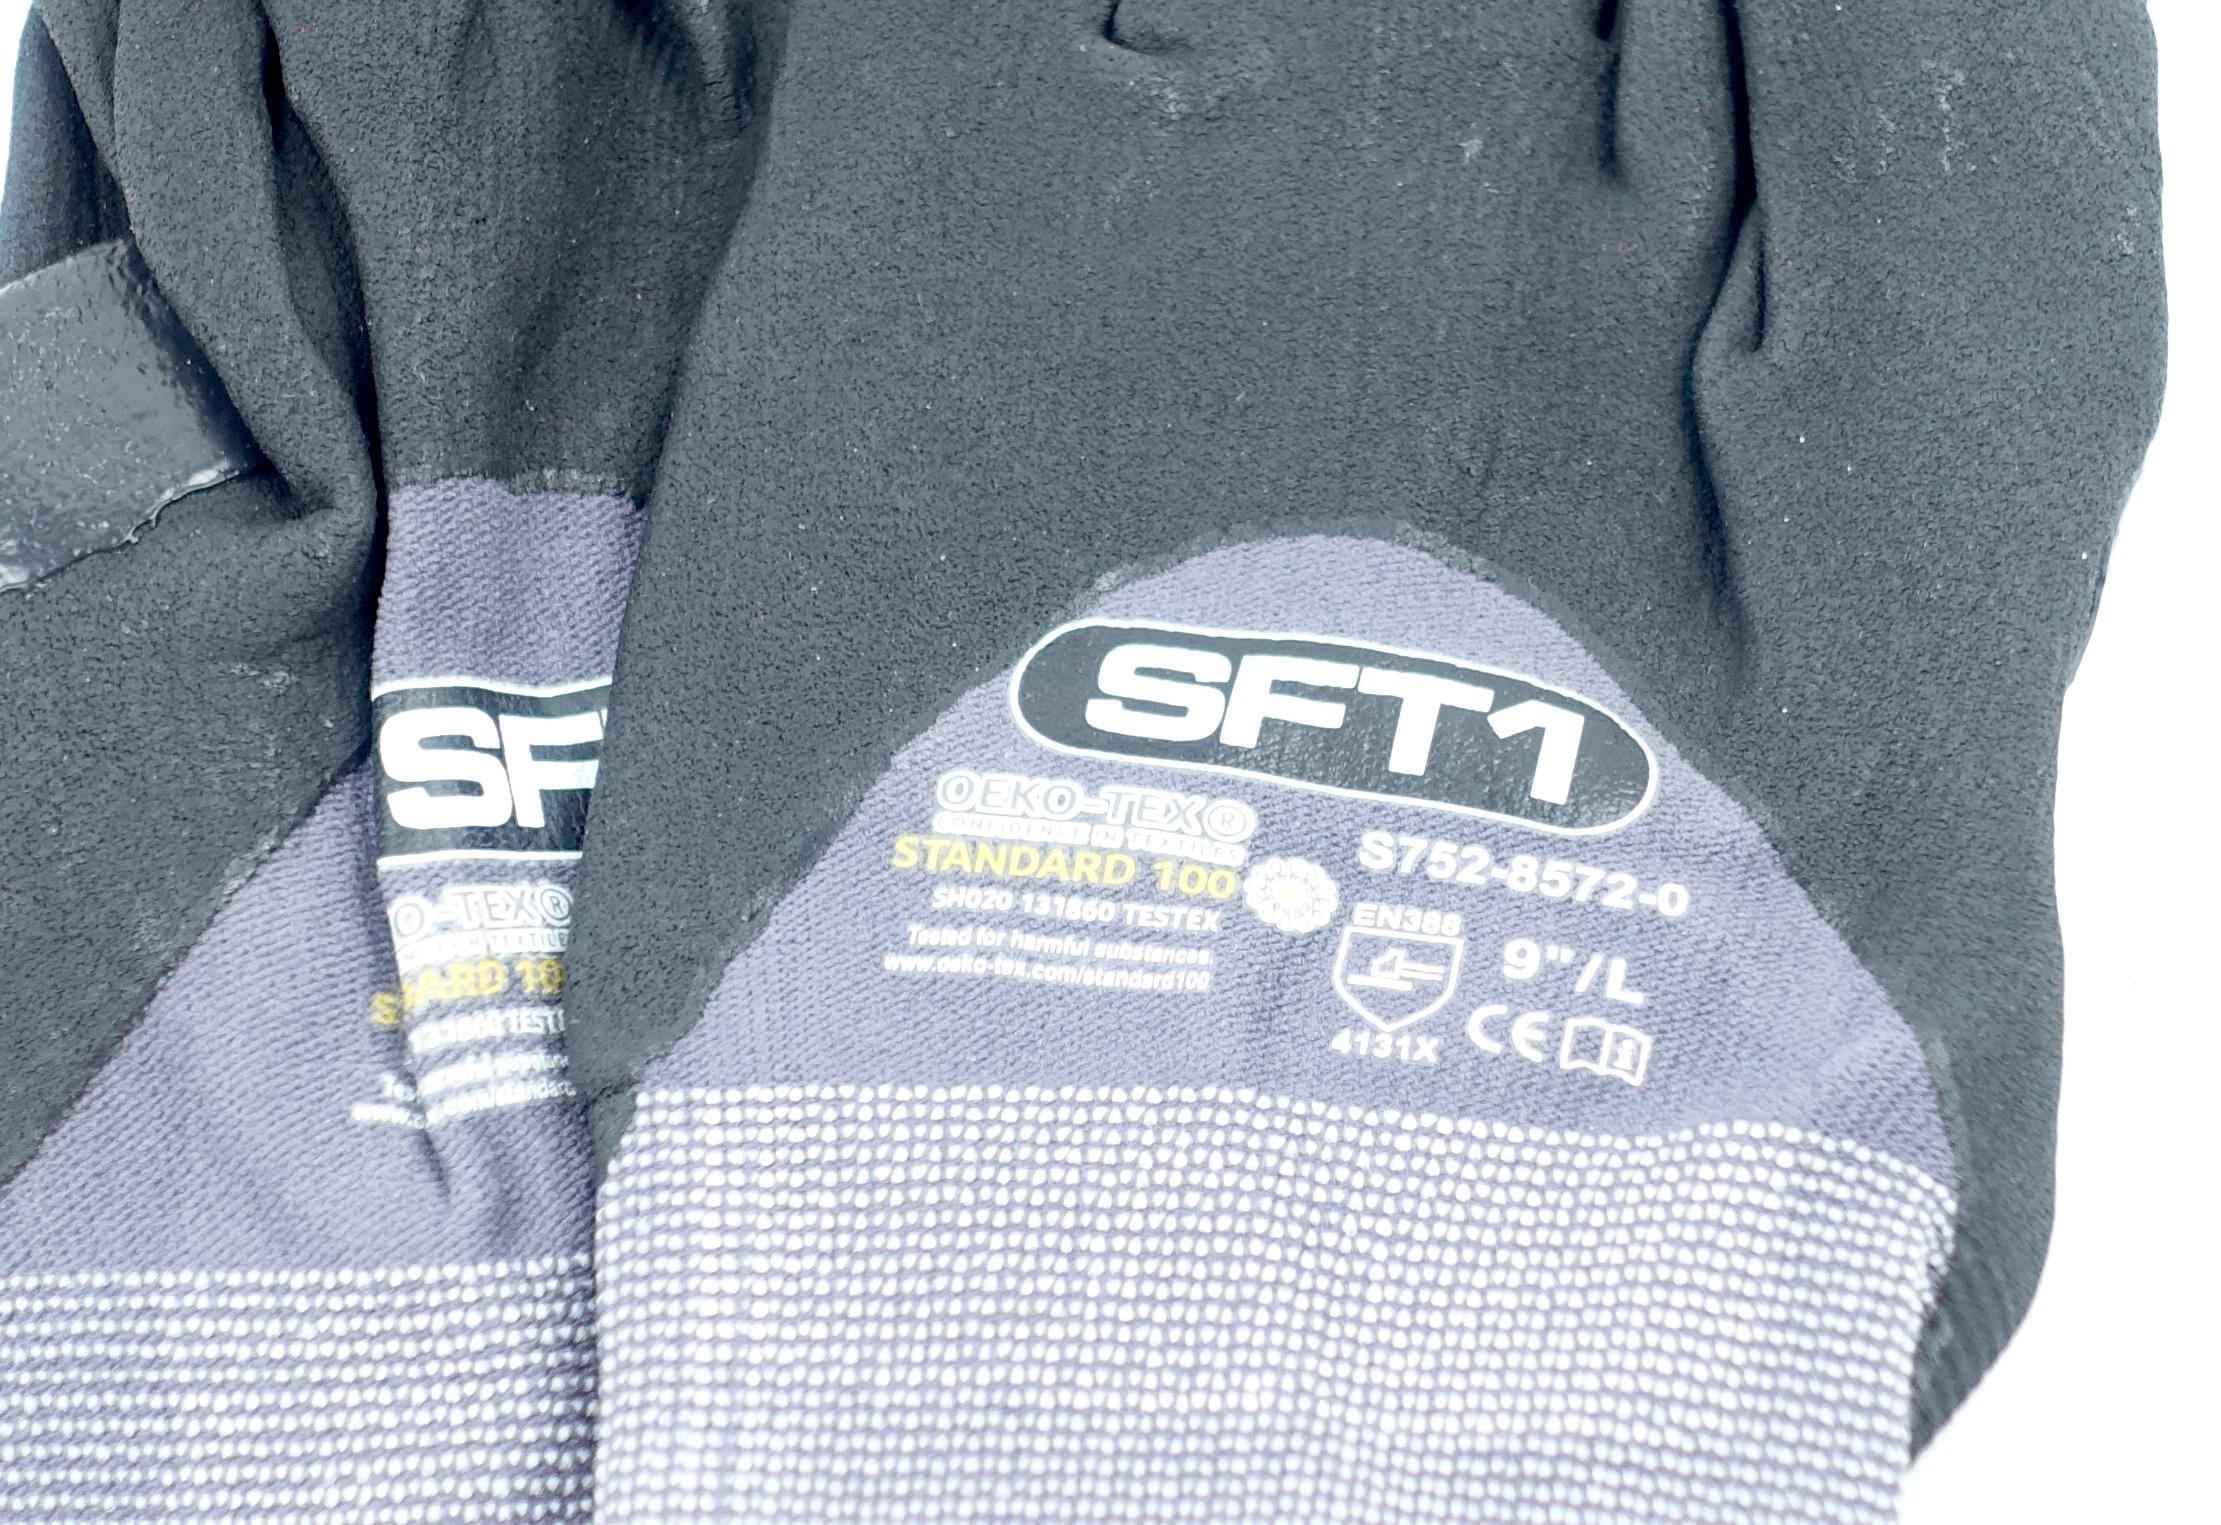 "Oeko-Tex S752-8572-0-9L SFT1 Standard 100 9"" Large Glove Gray/Black 1 Pair - image 2"